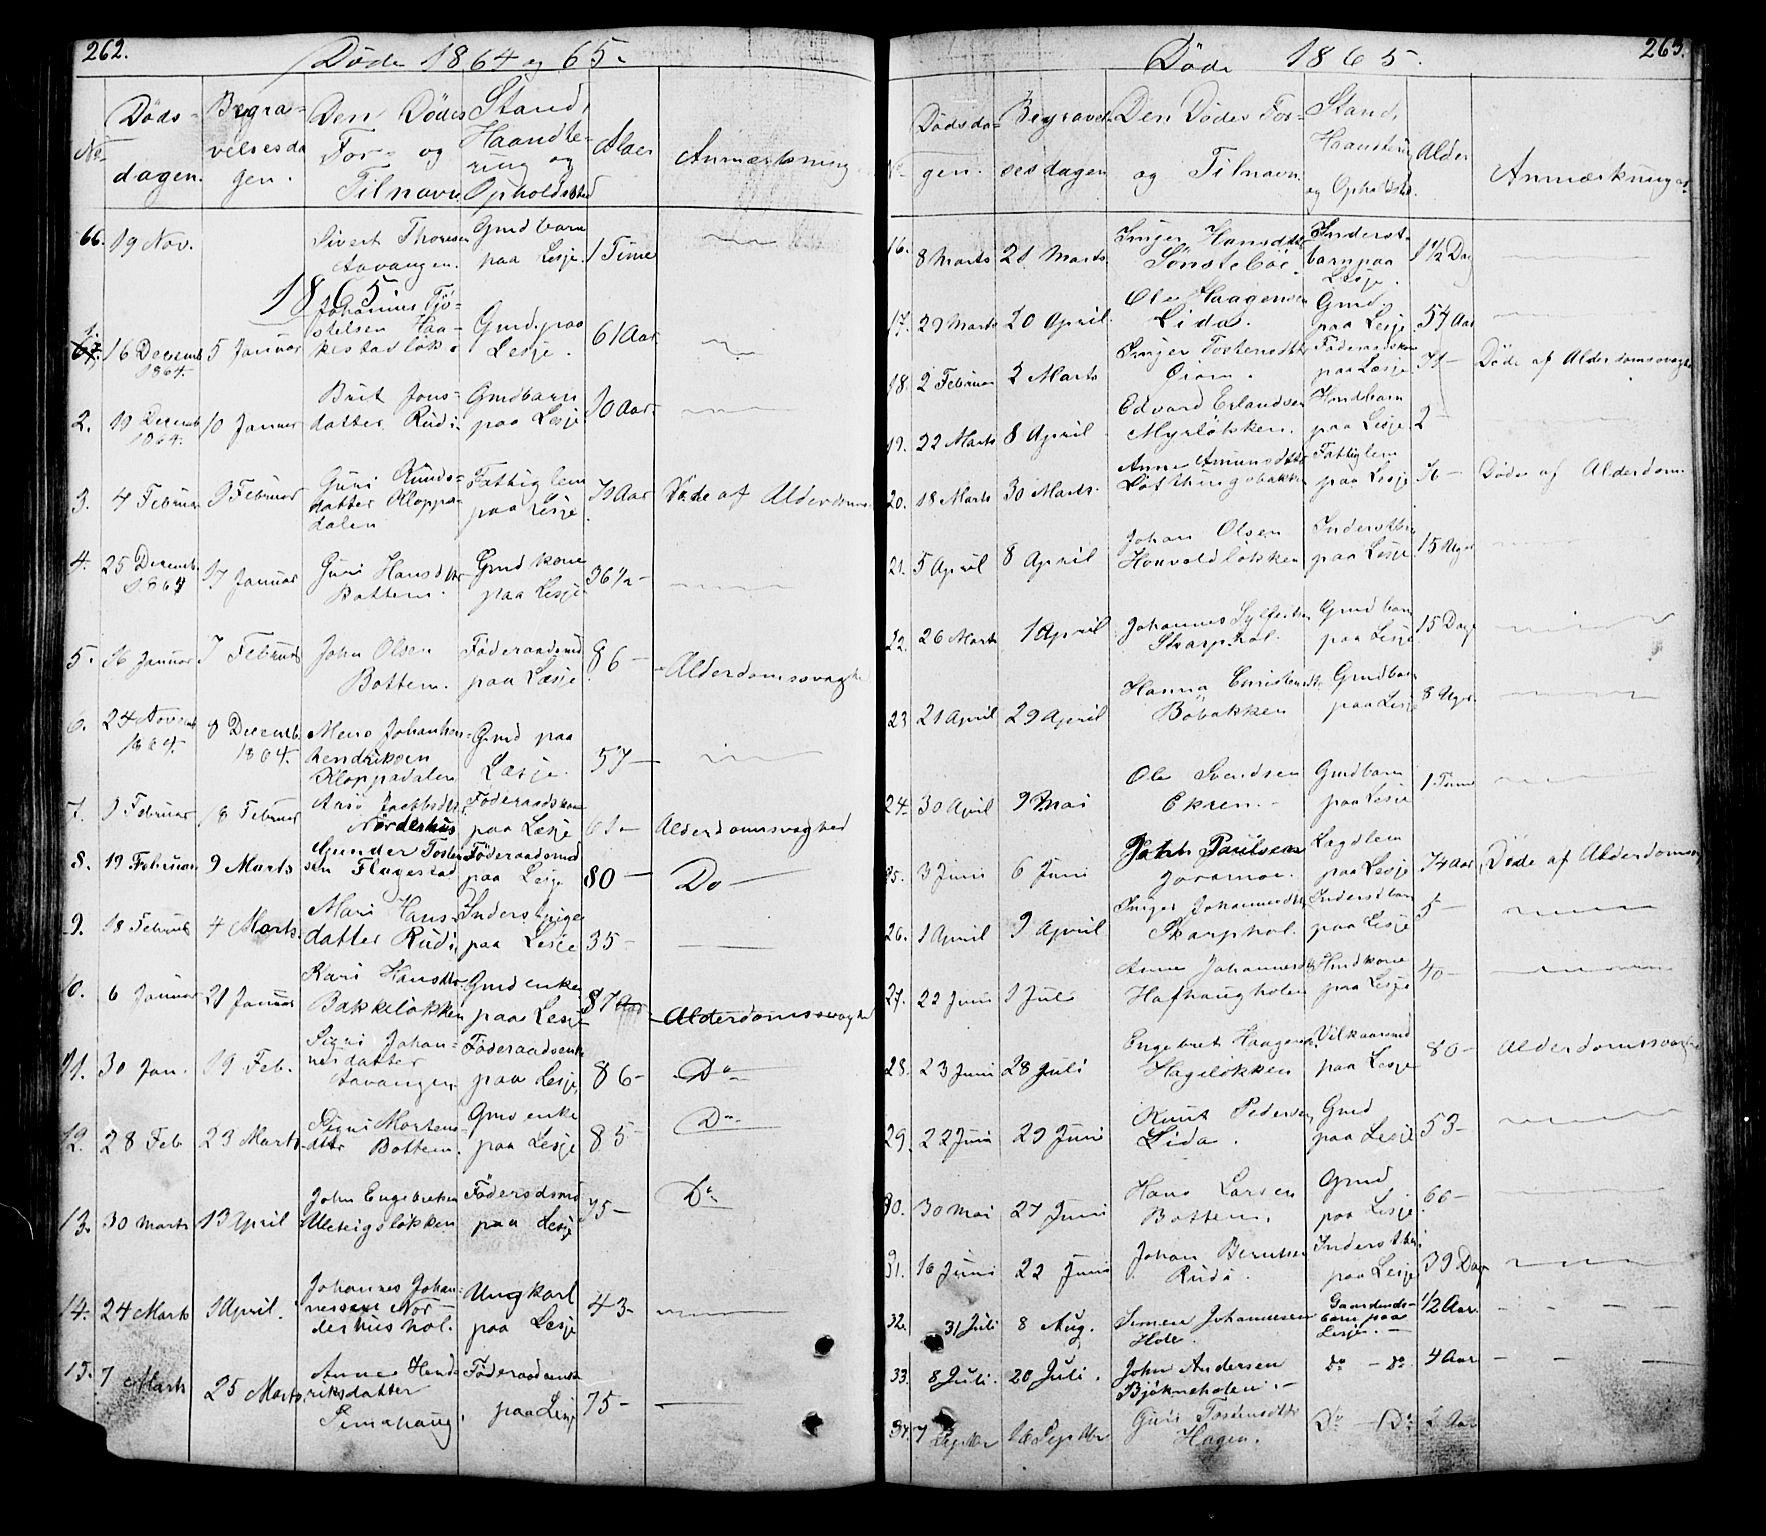 SAH, Lesja prestekontor, Klokkerbok nr. 5, 1850-1894, s. 262-263